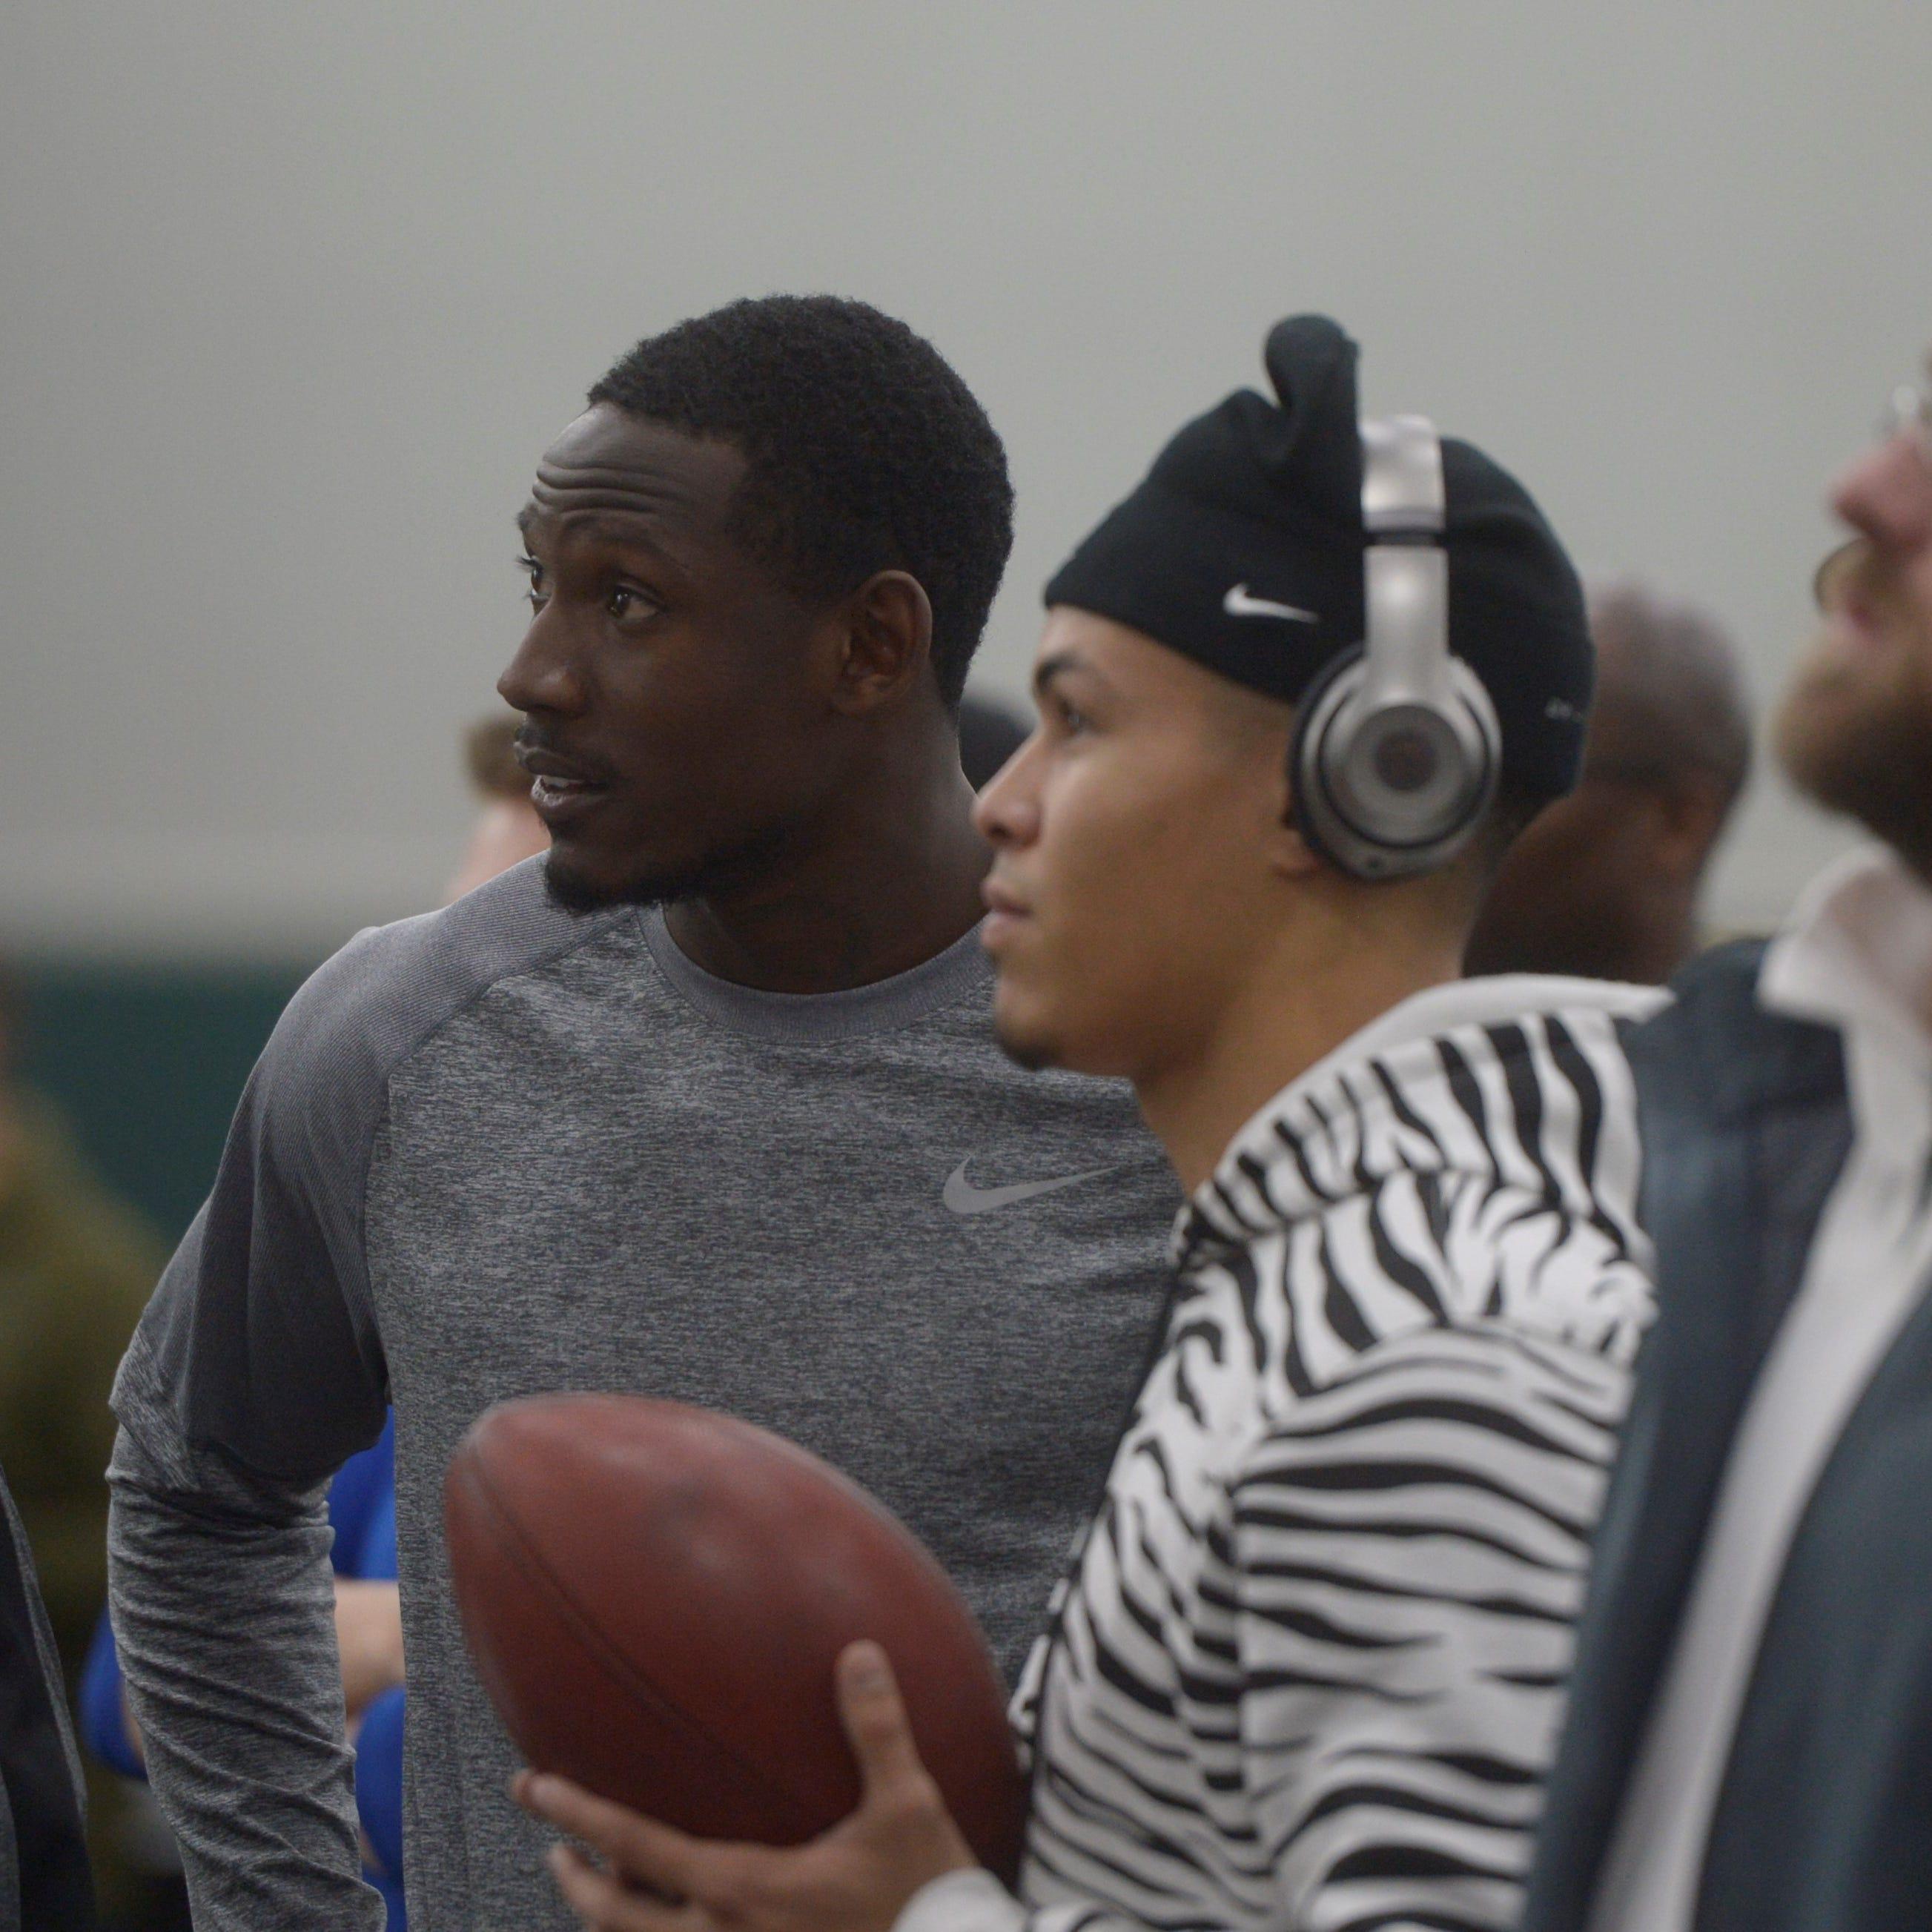 ESPN draft analyst expects CSU football's Preston Williams, Bisi Johnson to make it in NFL